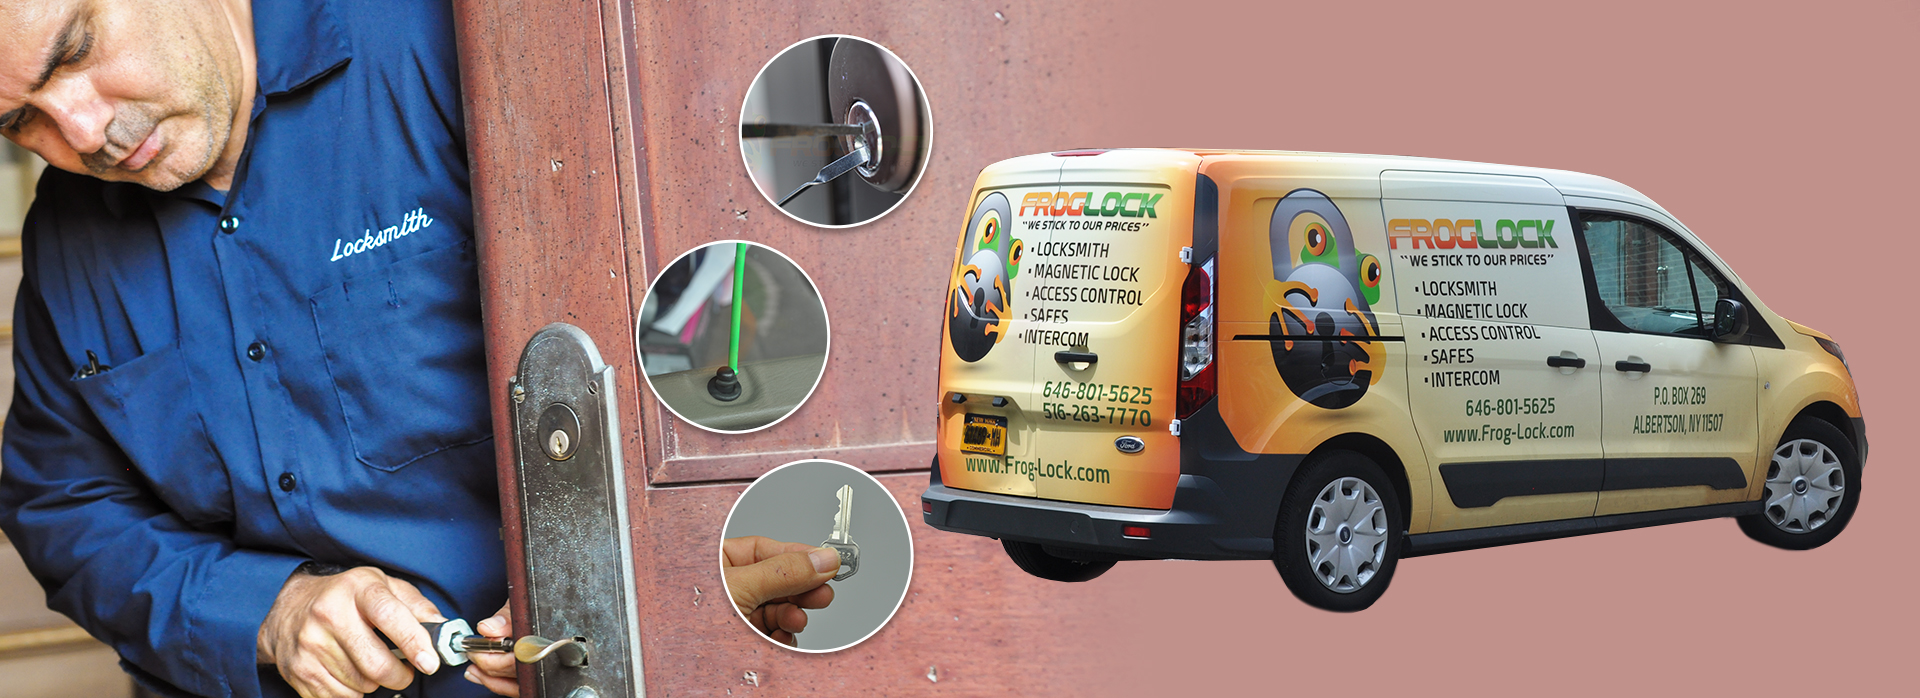 Frog Lock Long Island locksmith Service